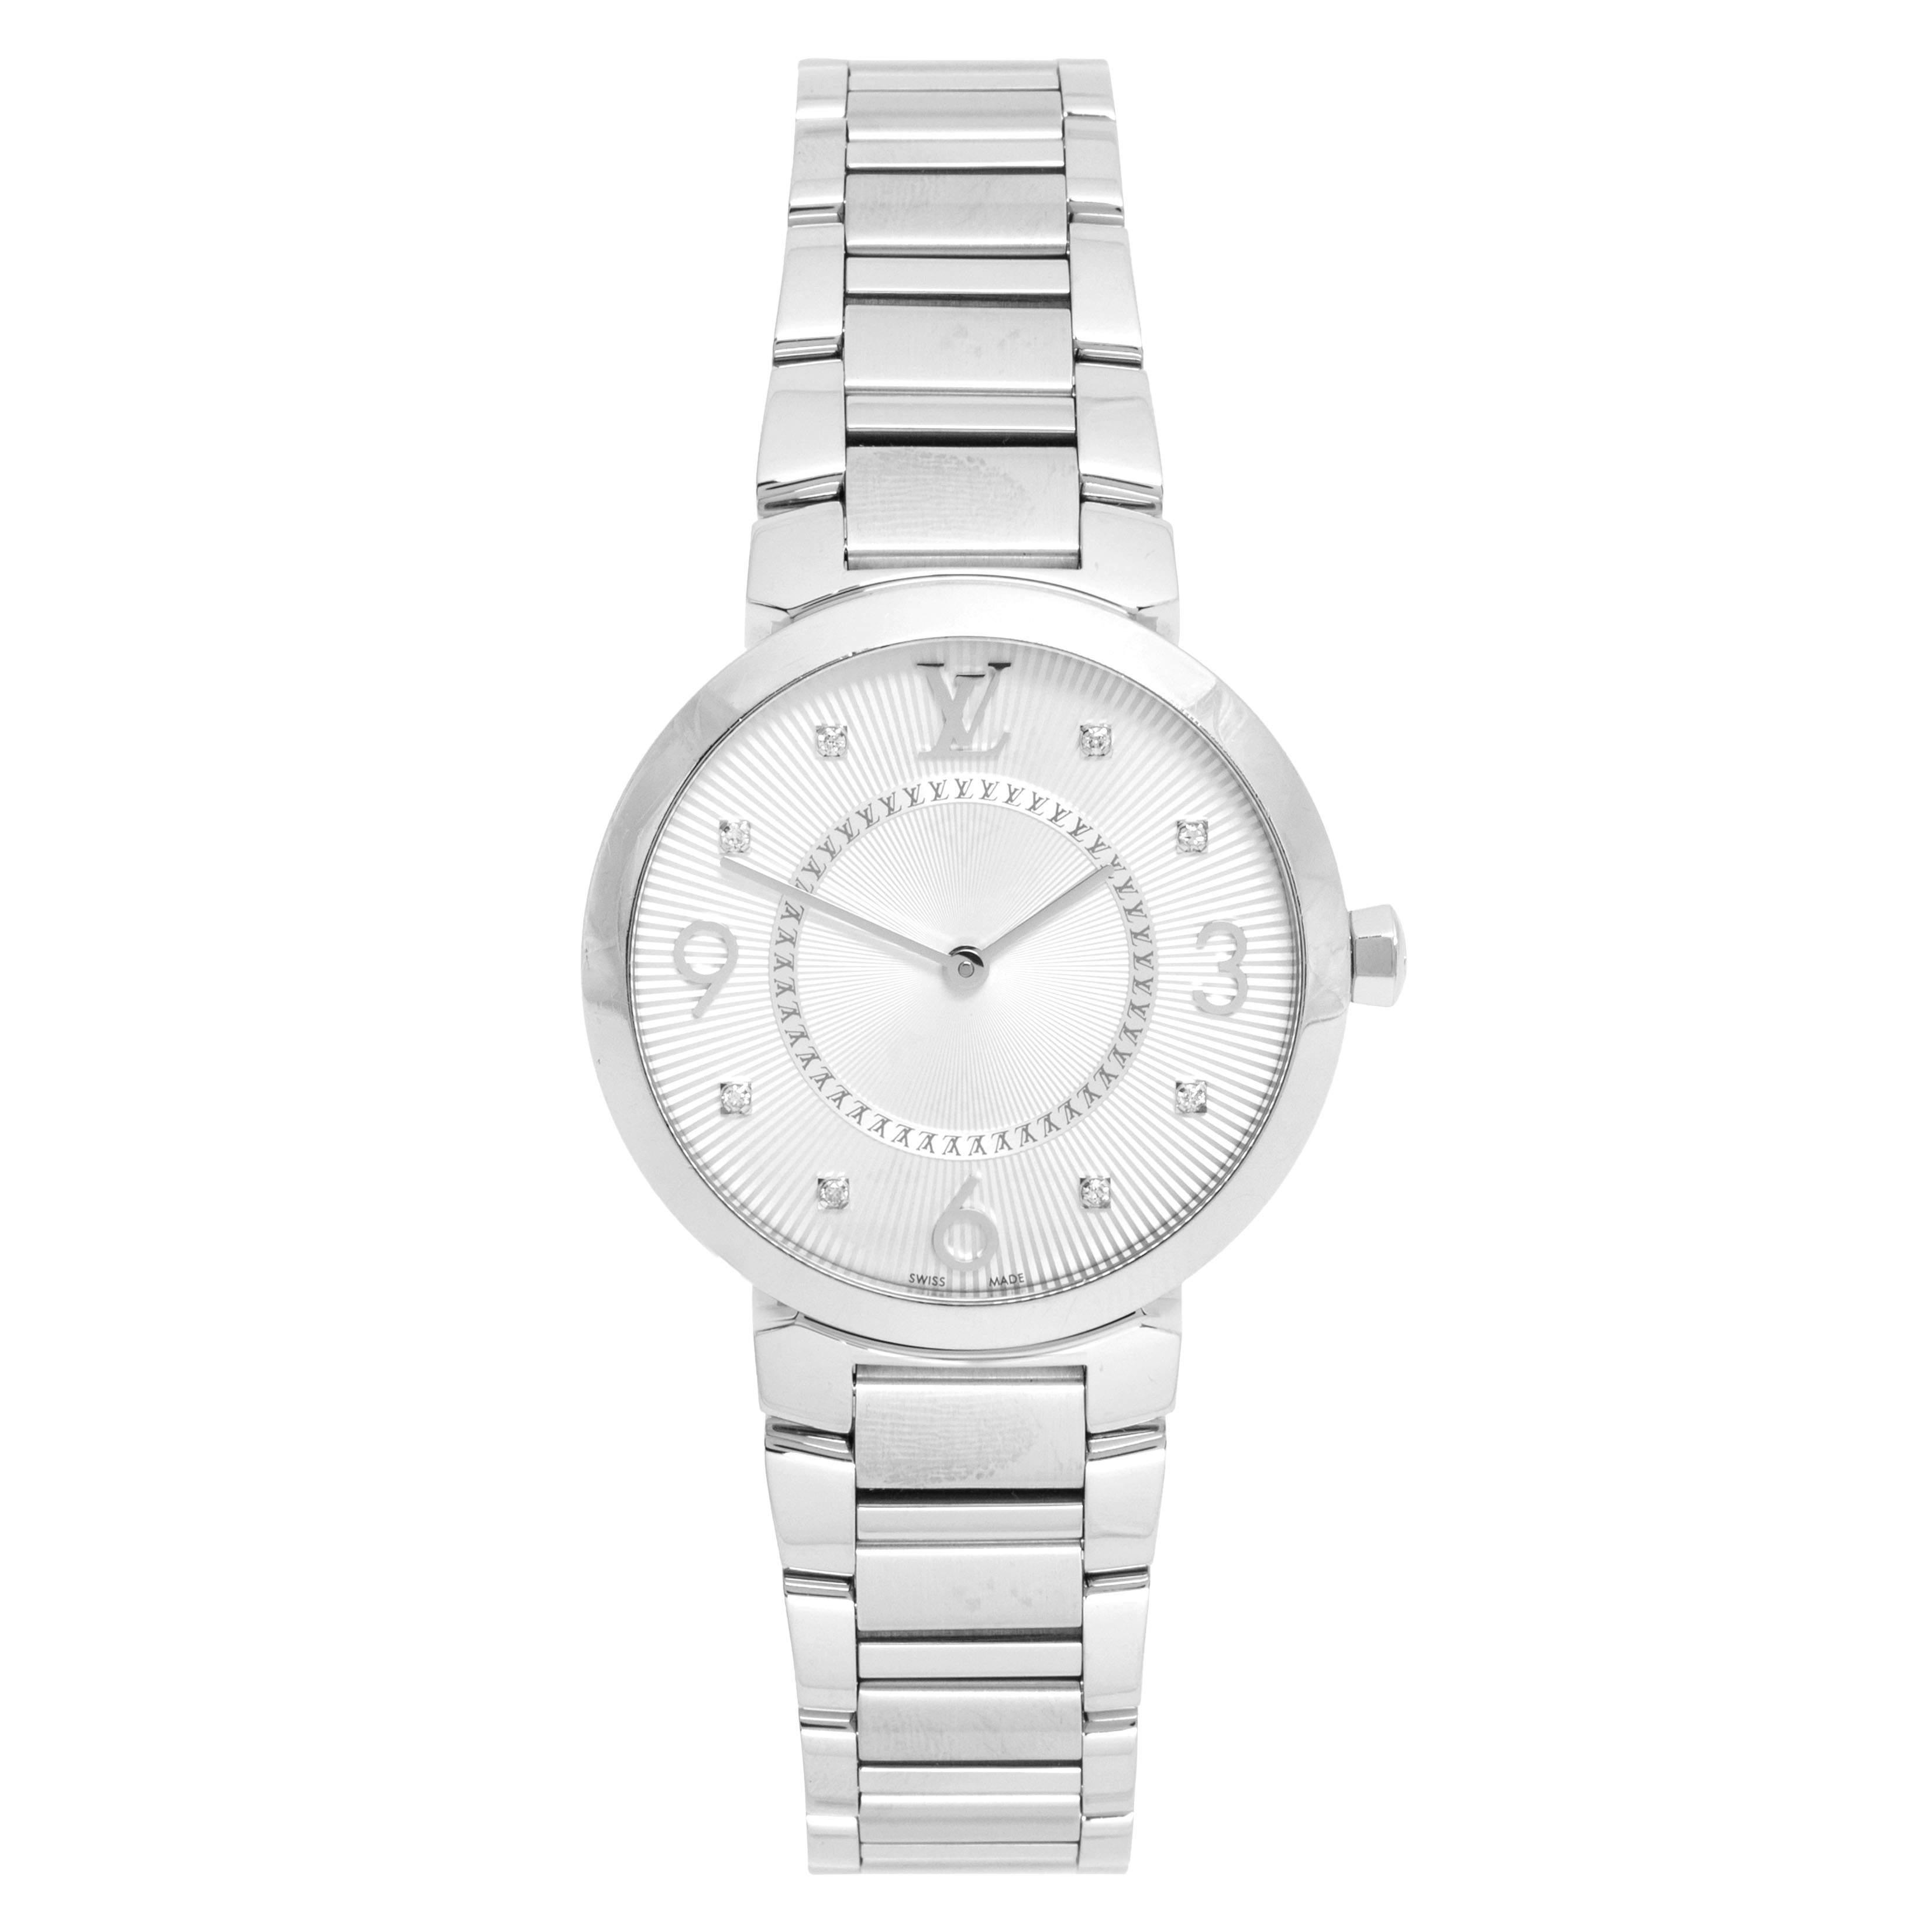 Louis Vuitton Silver White Stainless Steel Q13MJ4 Women's Wristwatch 33 mm